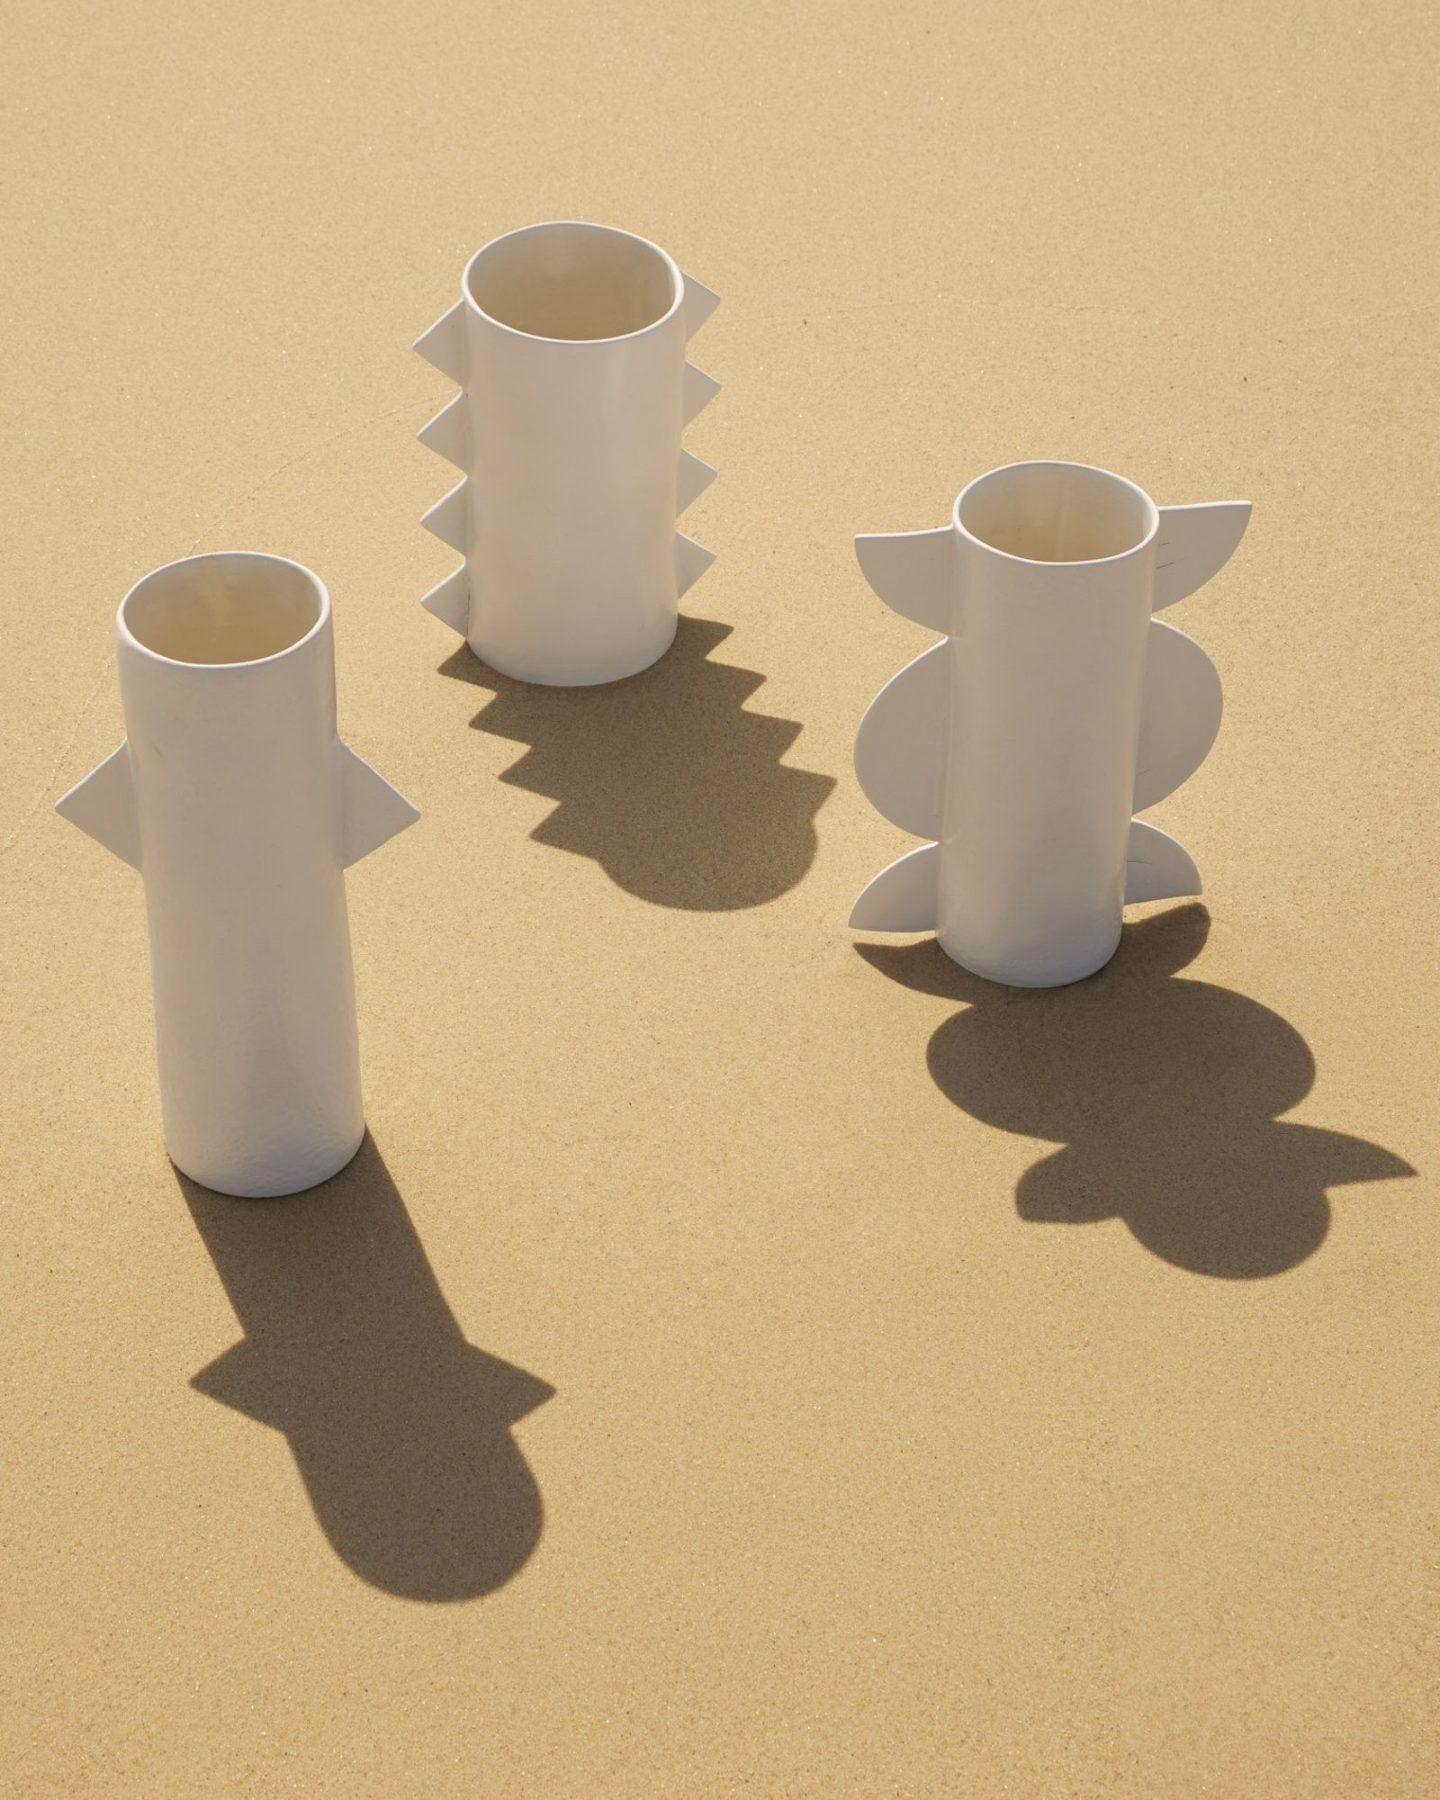 ignant-design-sarah-ellison-the-new-wave-001-1440x1800-2